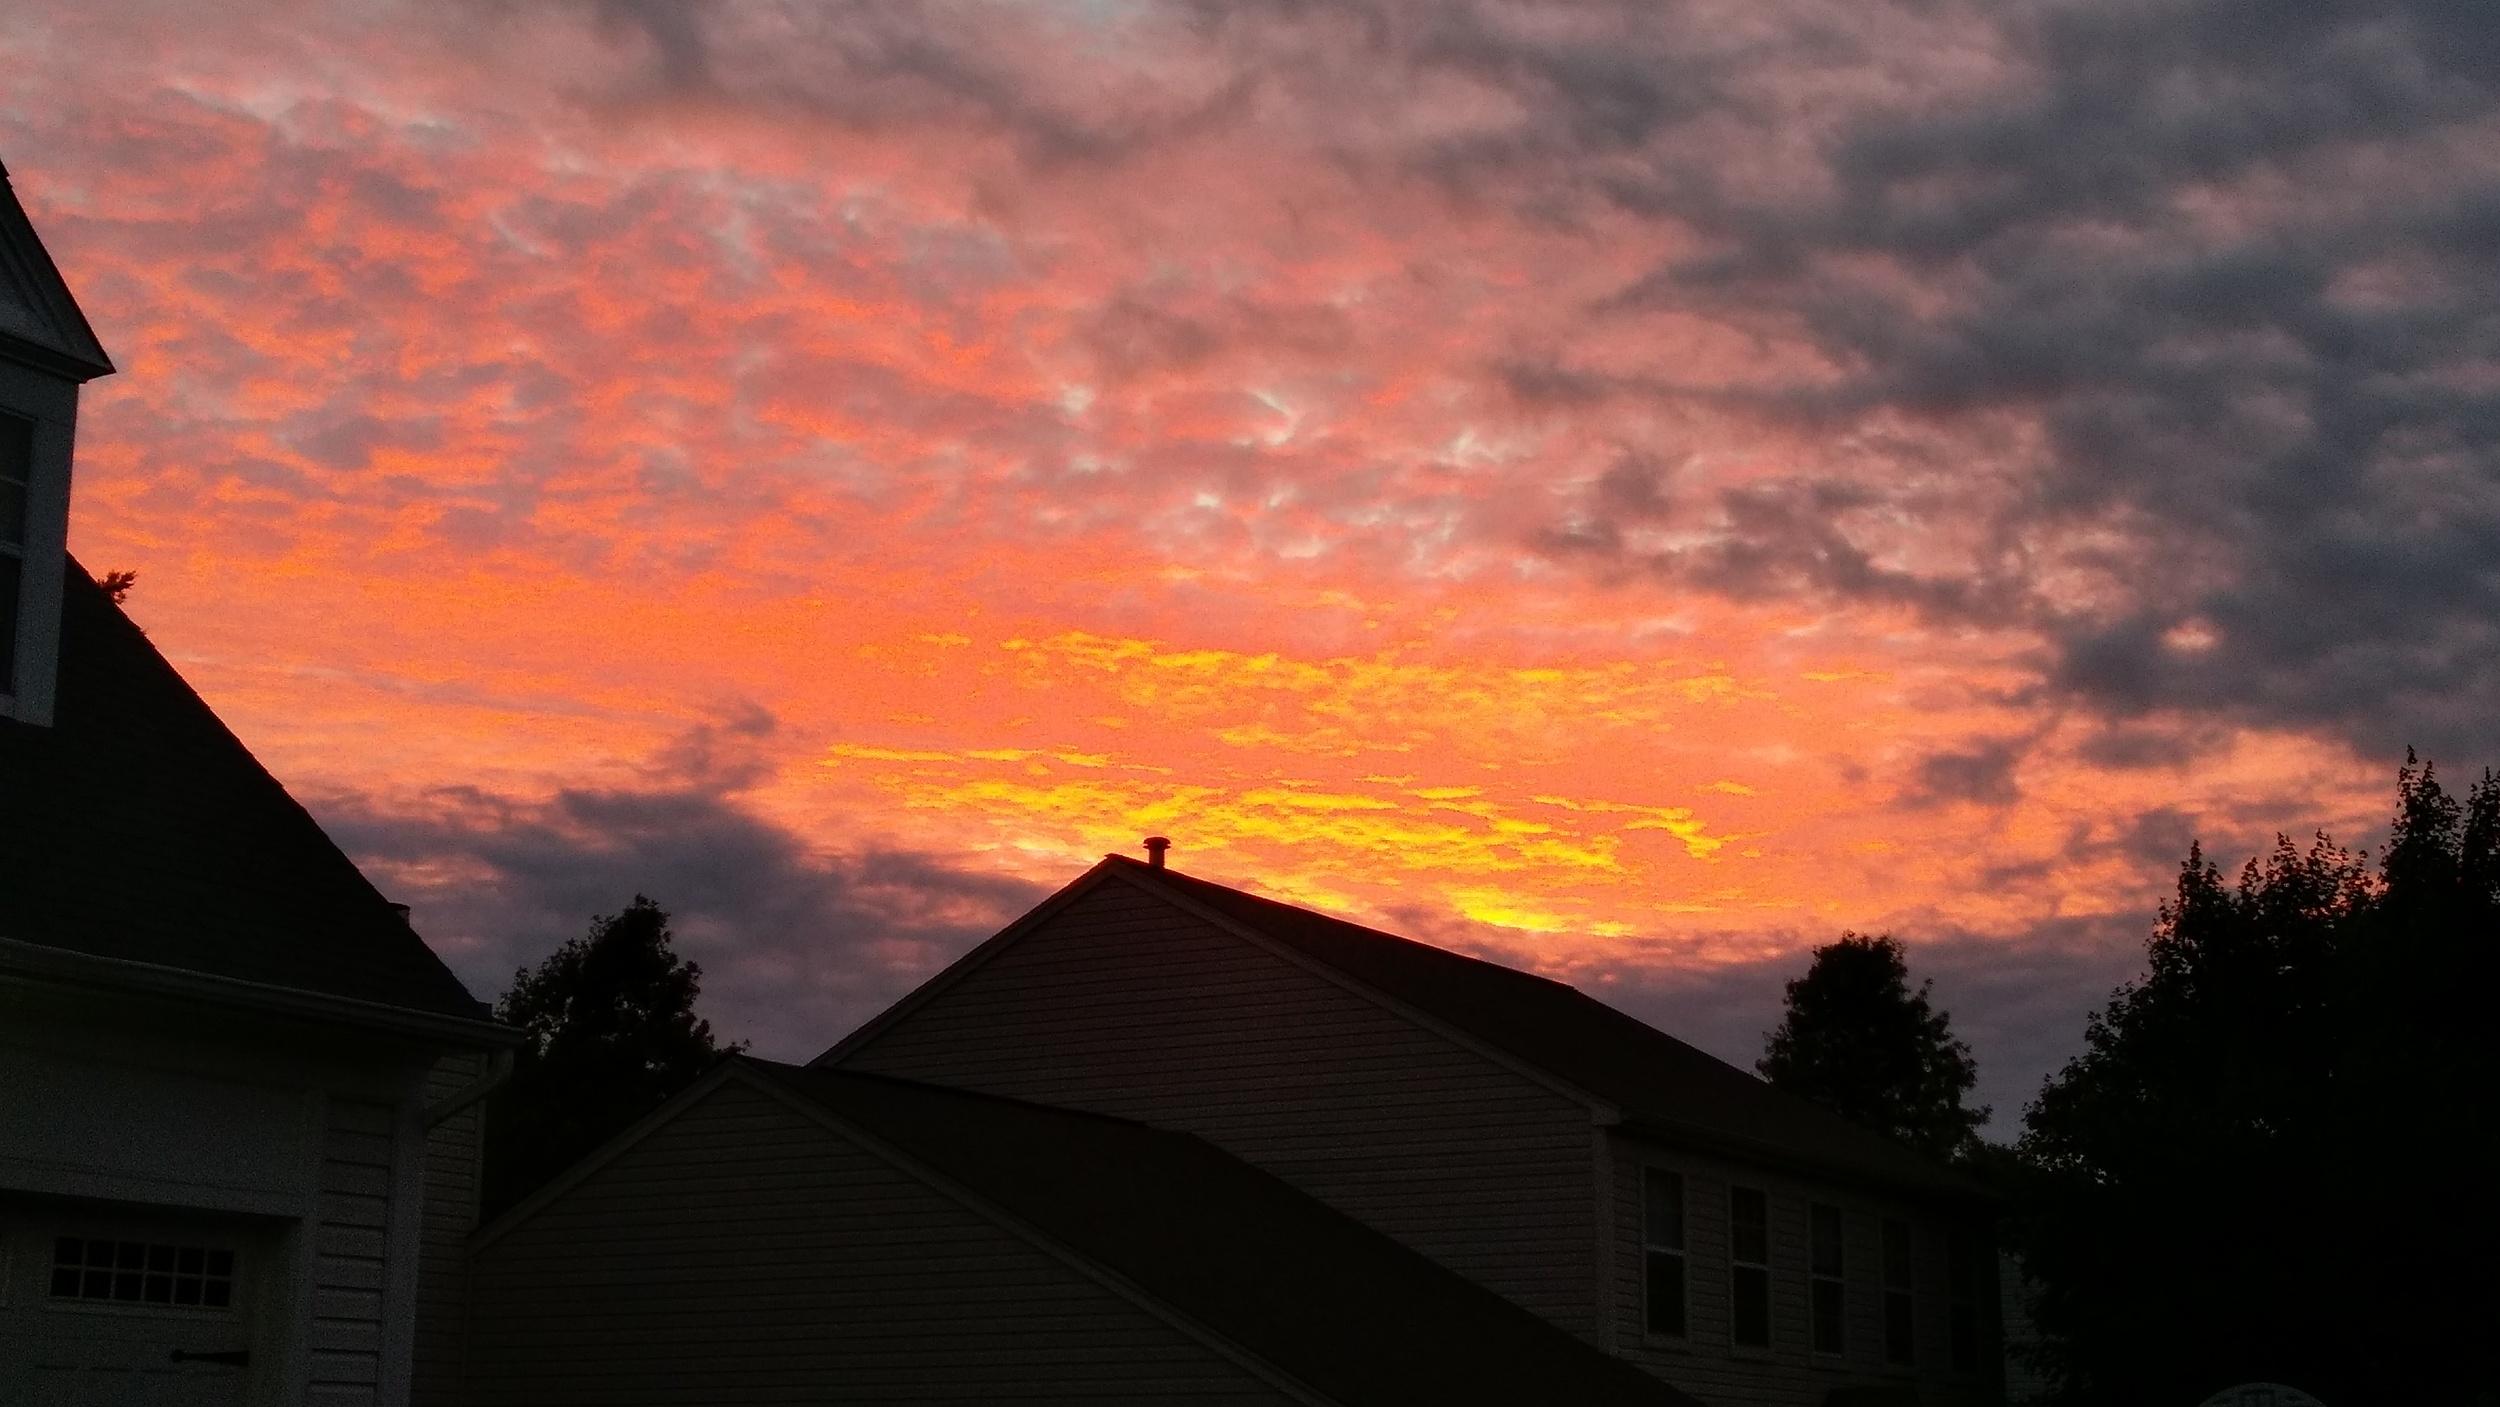 Random morning photo. It was a pretty sunrise.